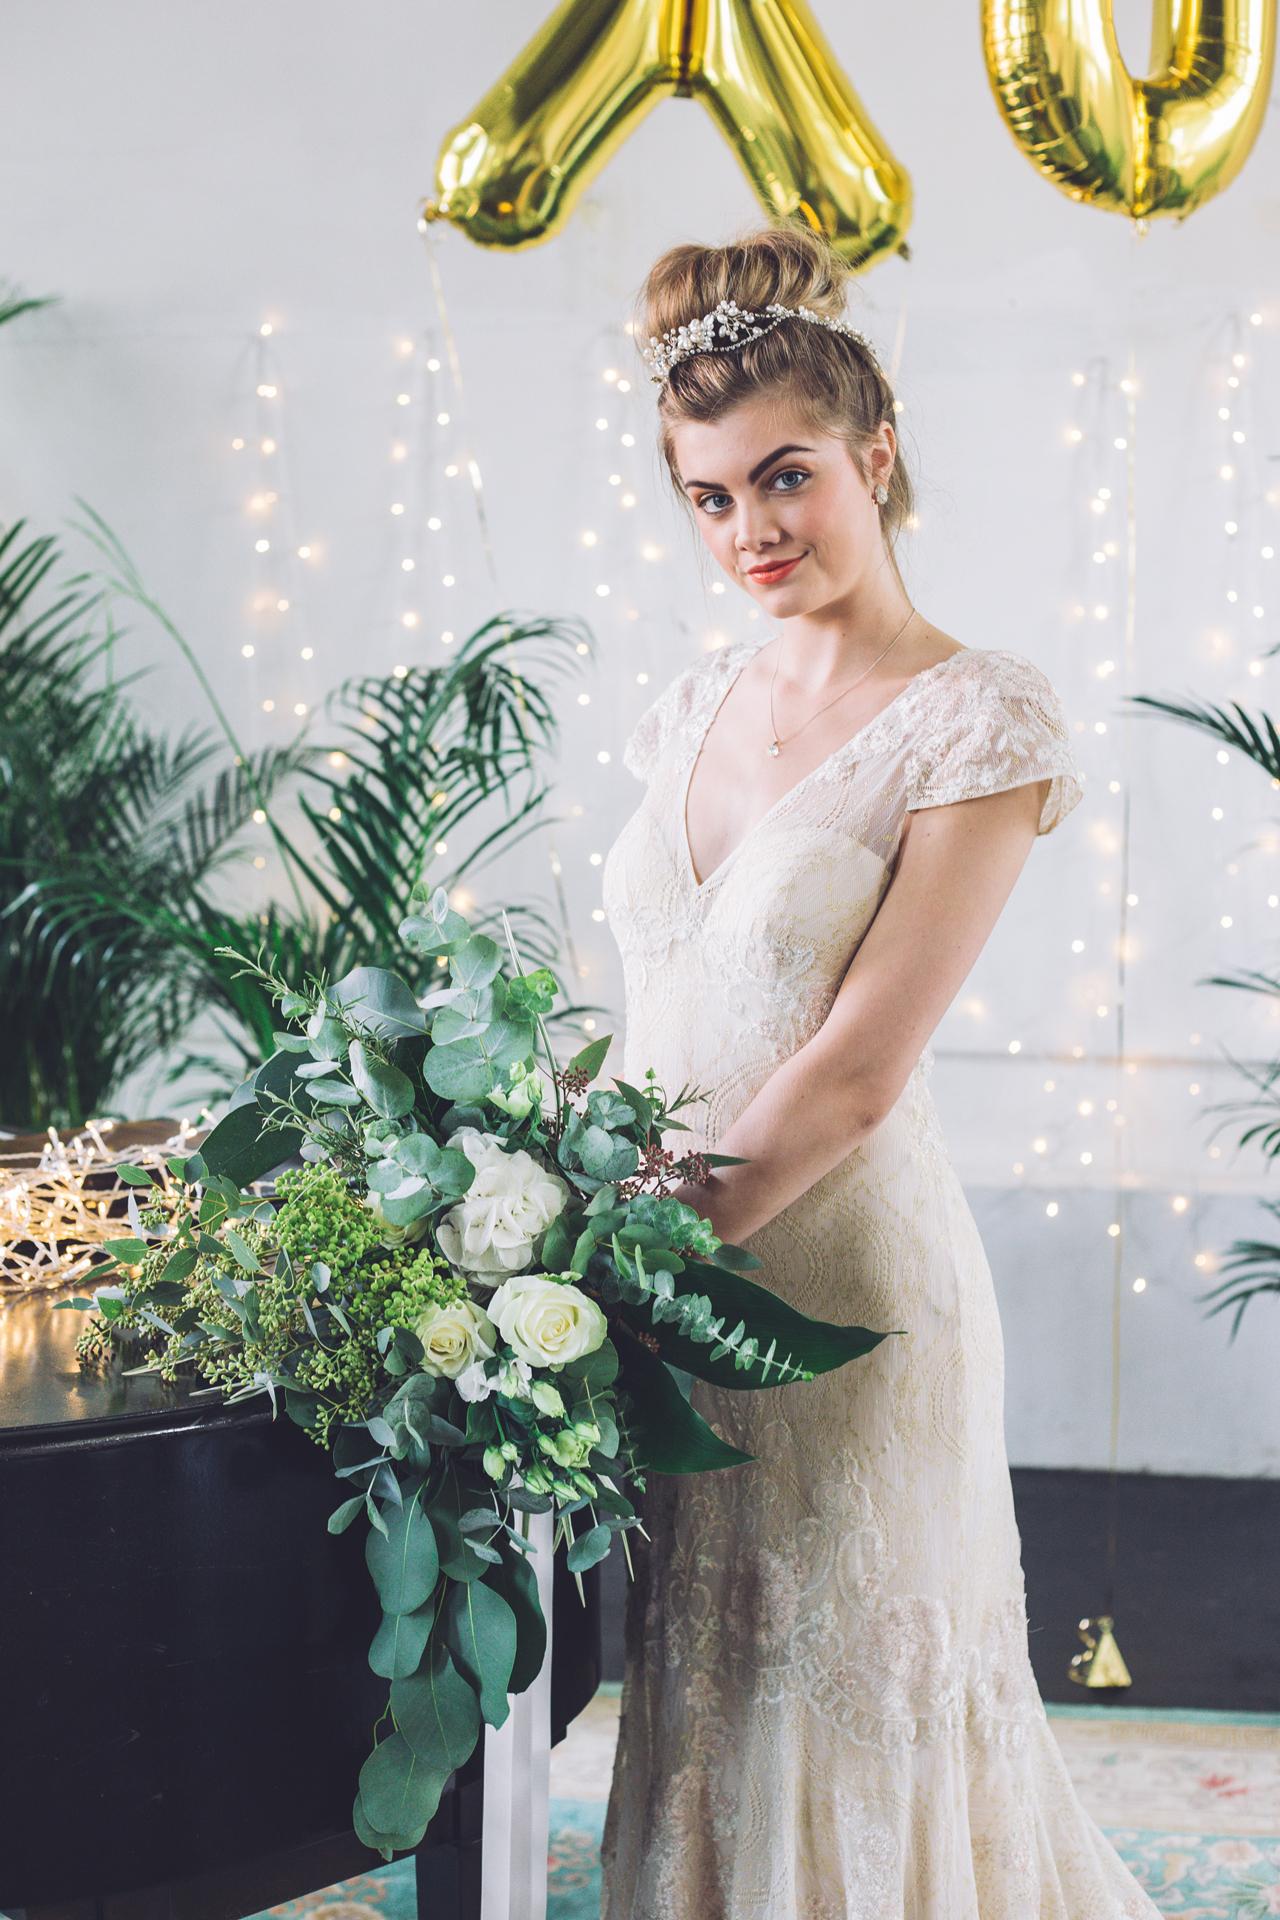 wedding_photographer_norfolk_norwich_kings_lynn (7).jpg